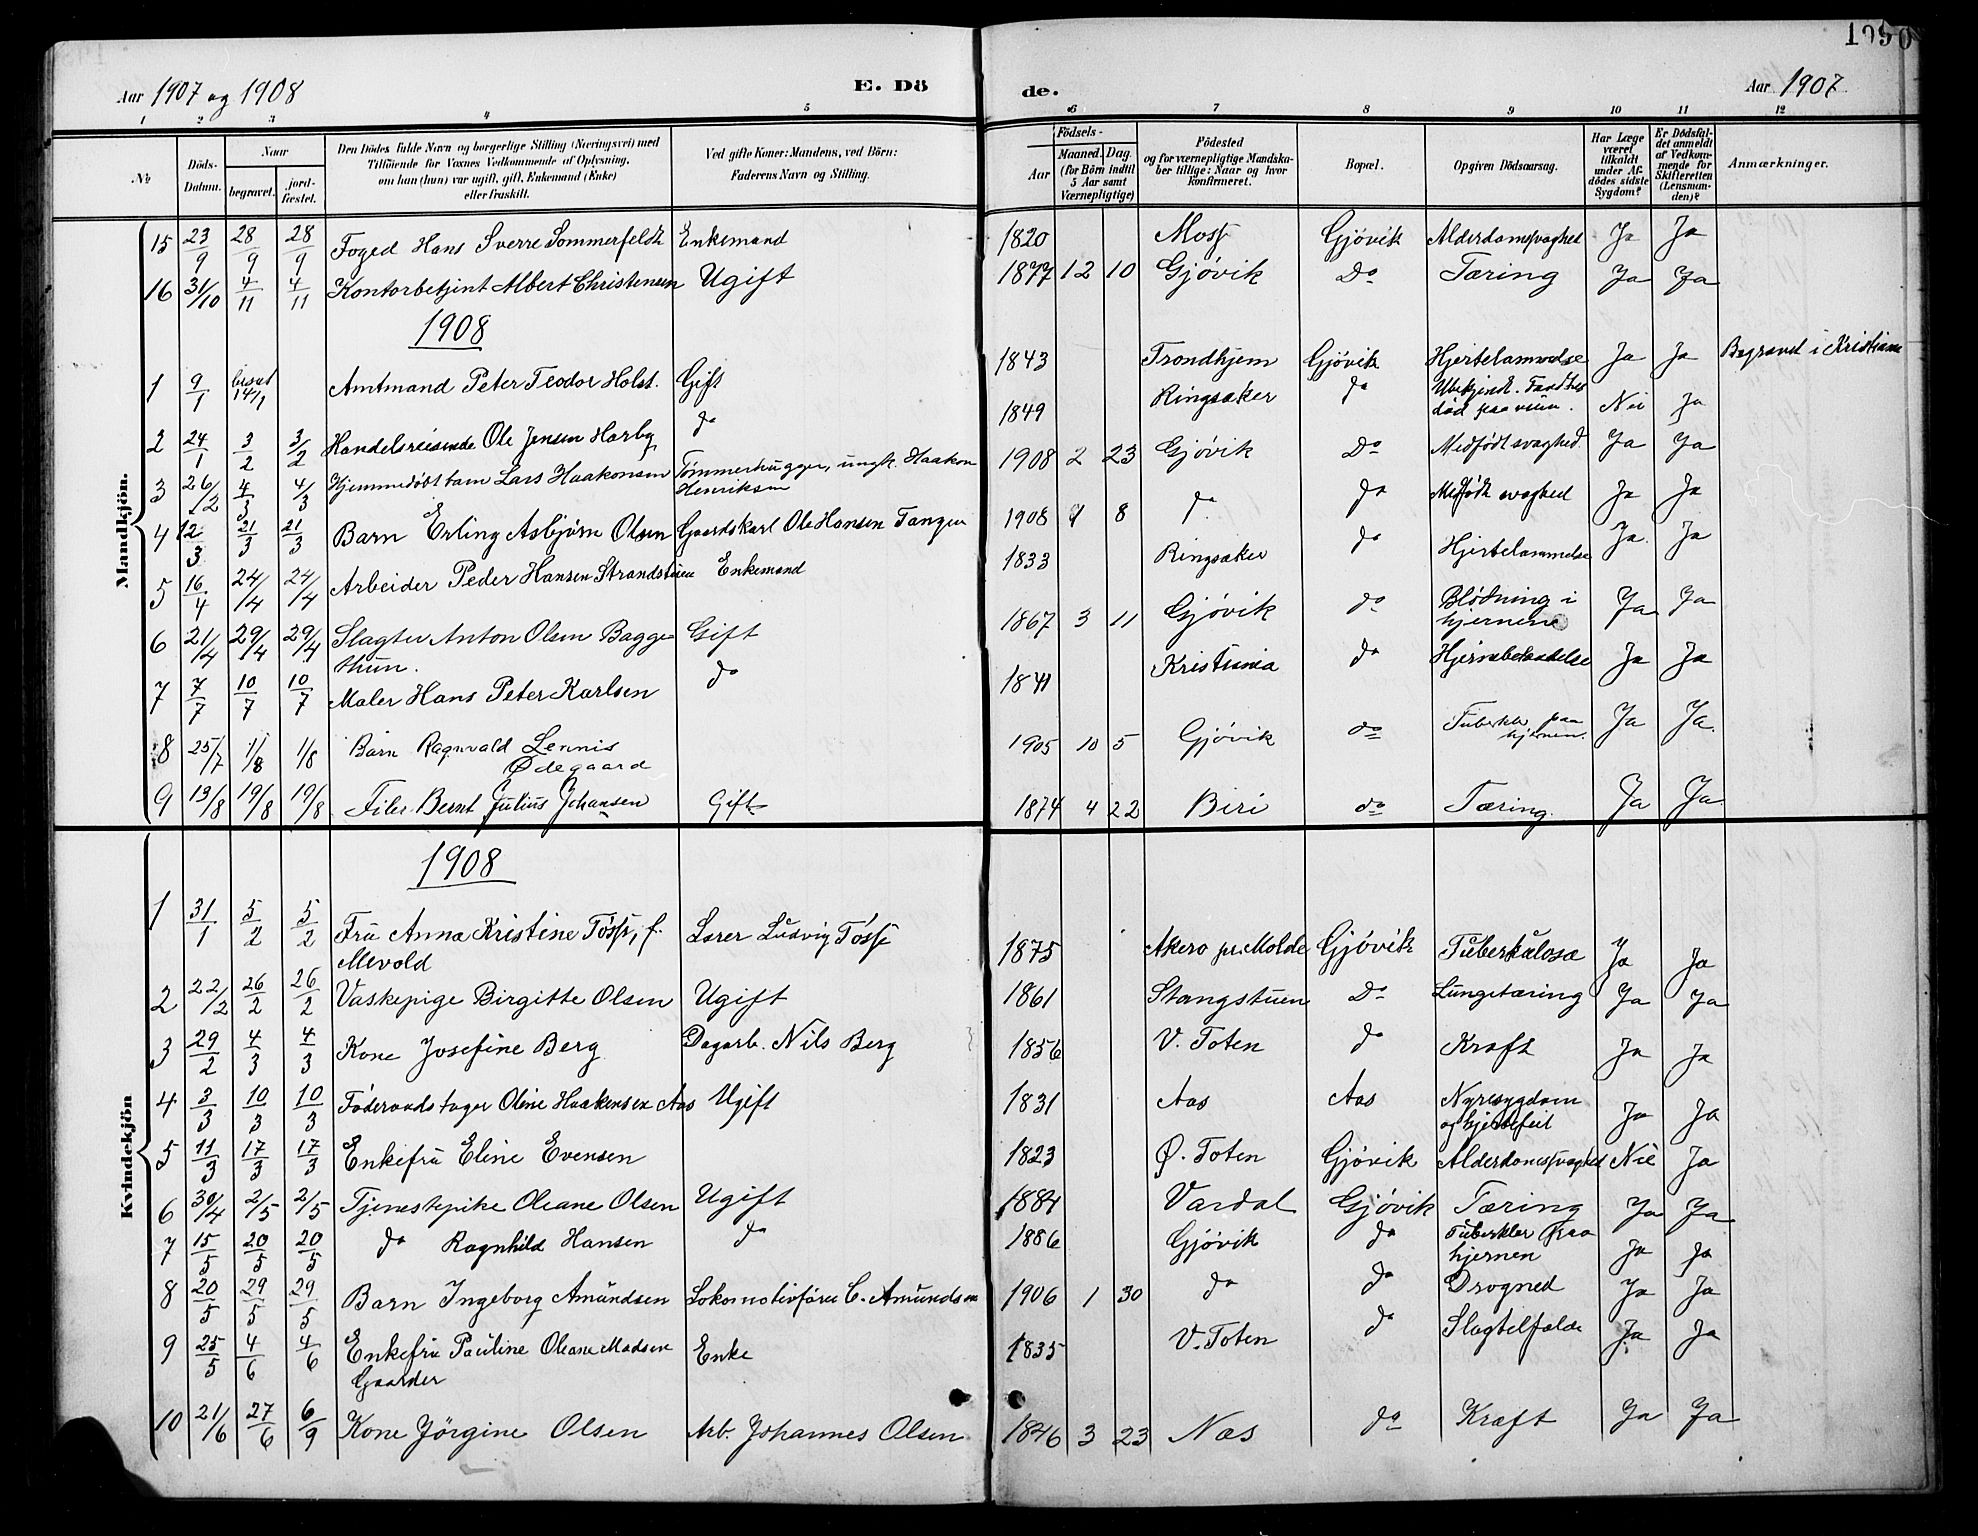 SAH, Vardal prestekontor, H/Ha/Hab/L0012: Klokkerbok nr. 12, 1902-1911, s. 199